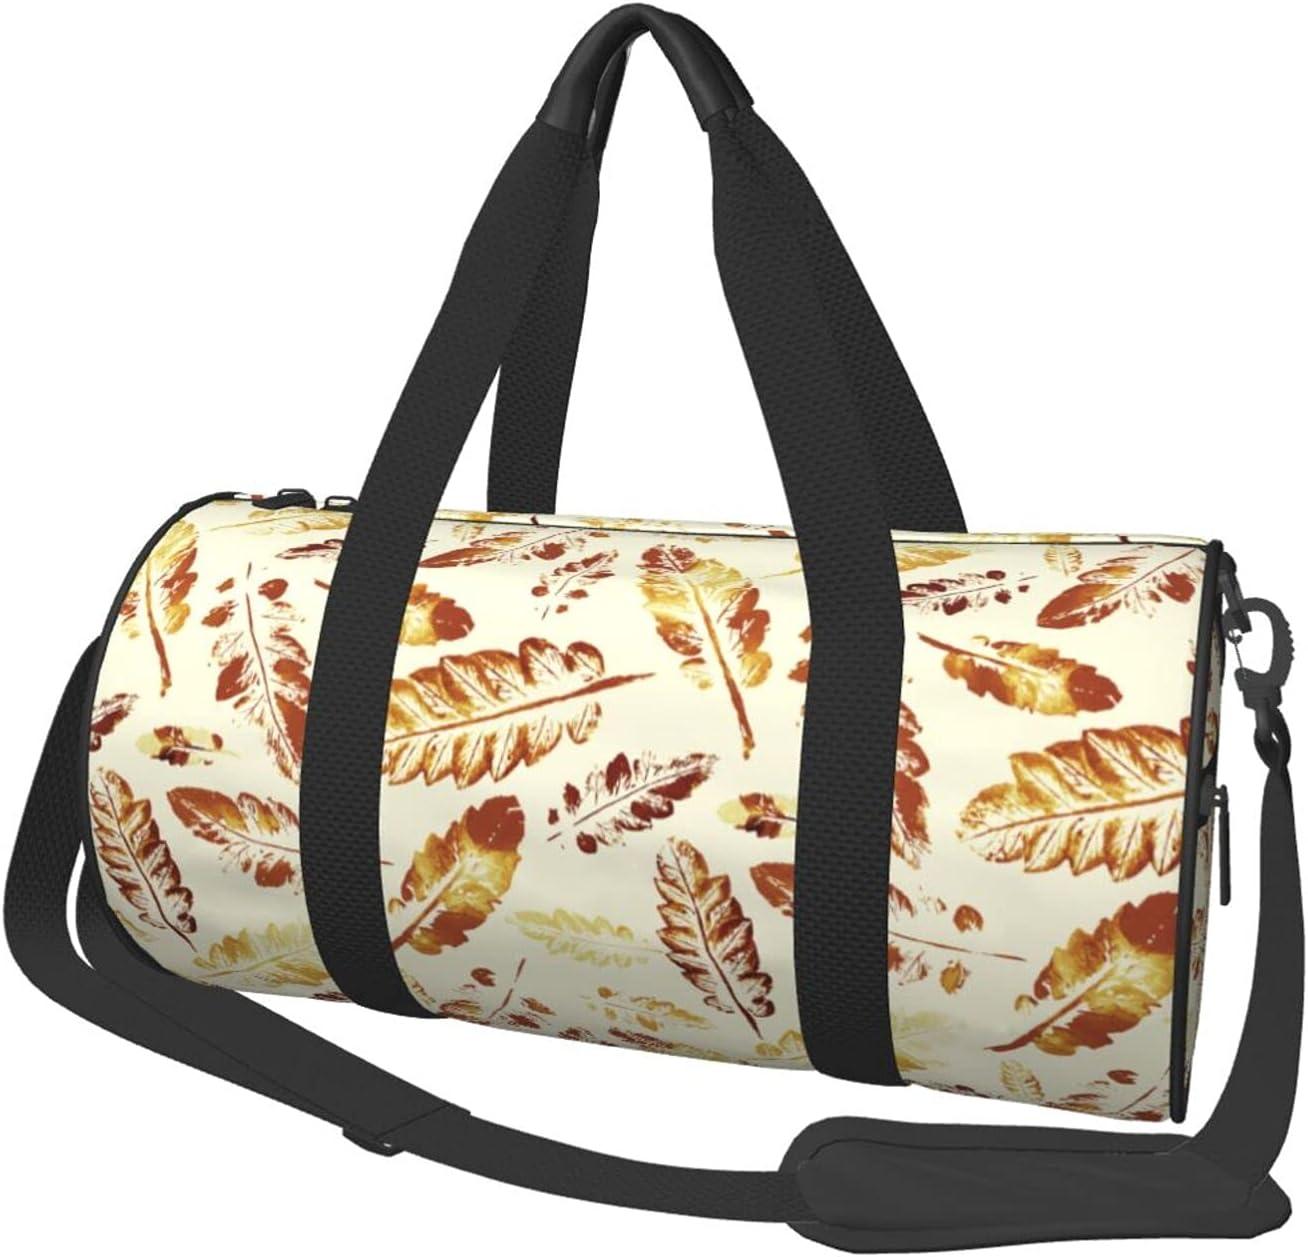 Fredeulva Max 41% OFF Autumn Watercolor Leaves Time sale Duffel Shoulder Canvas Bag Ro